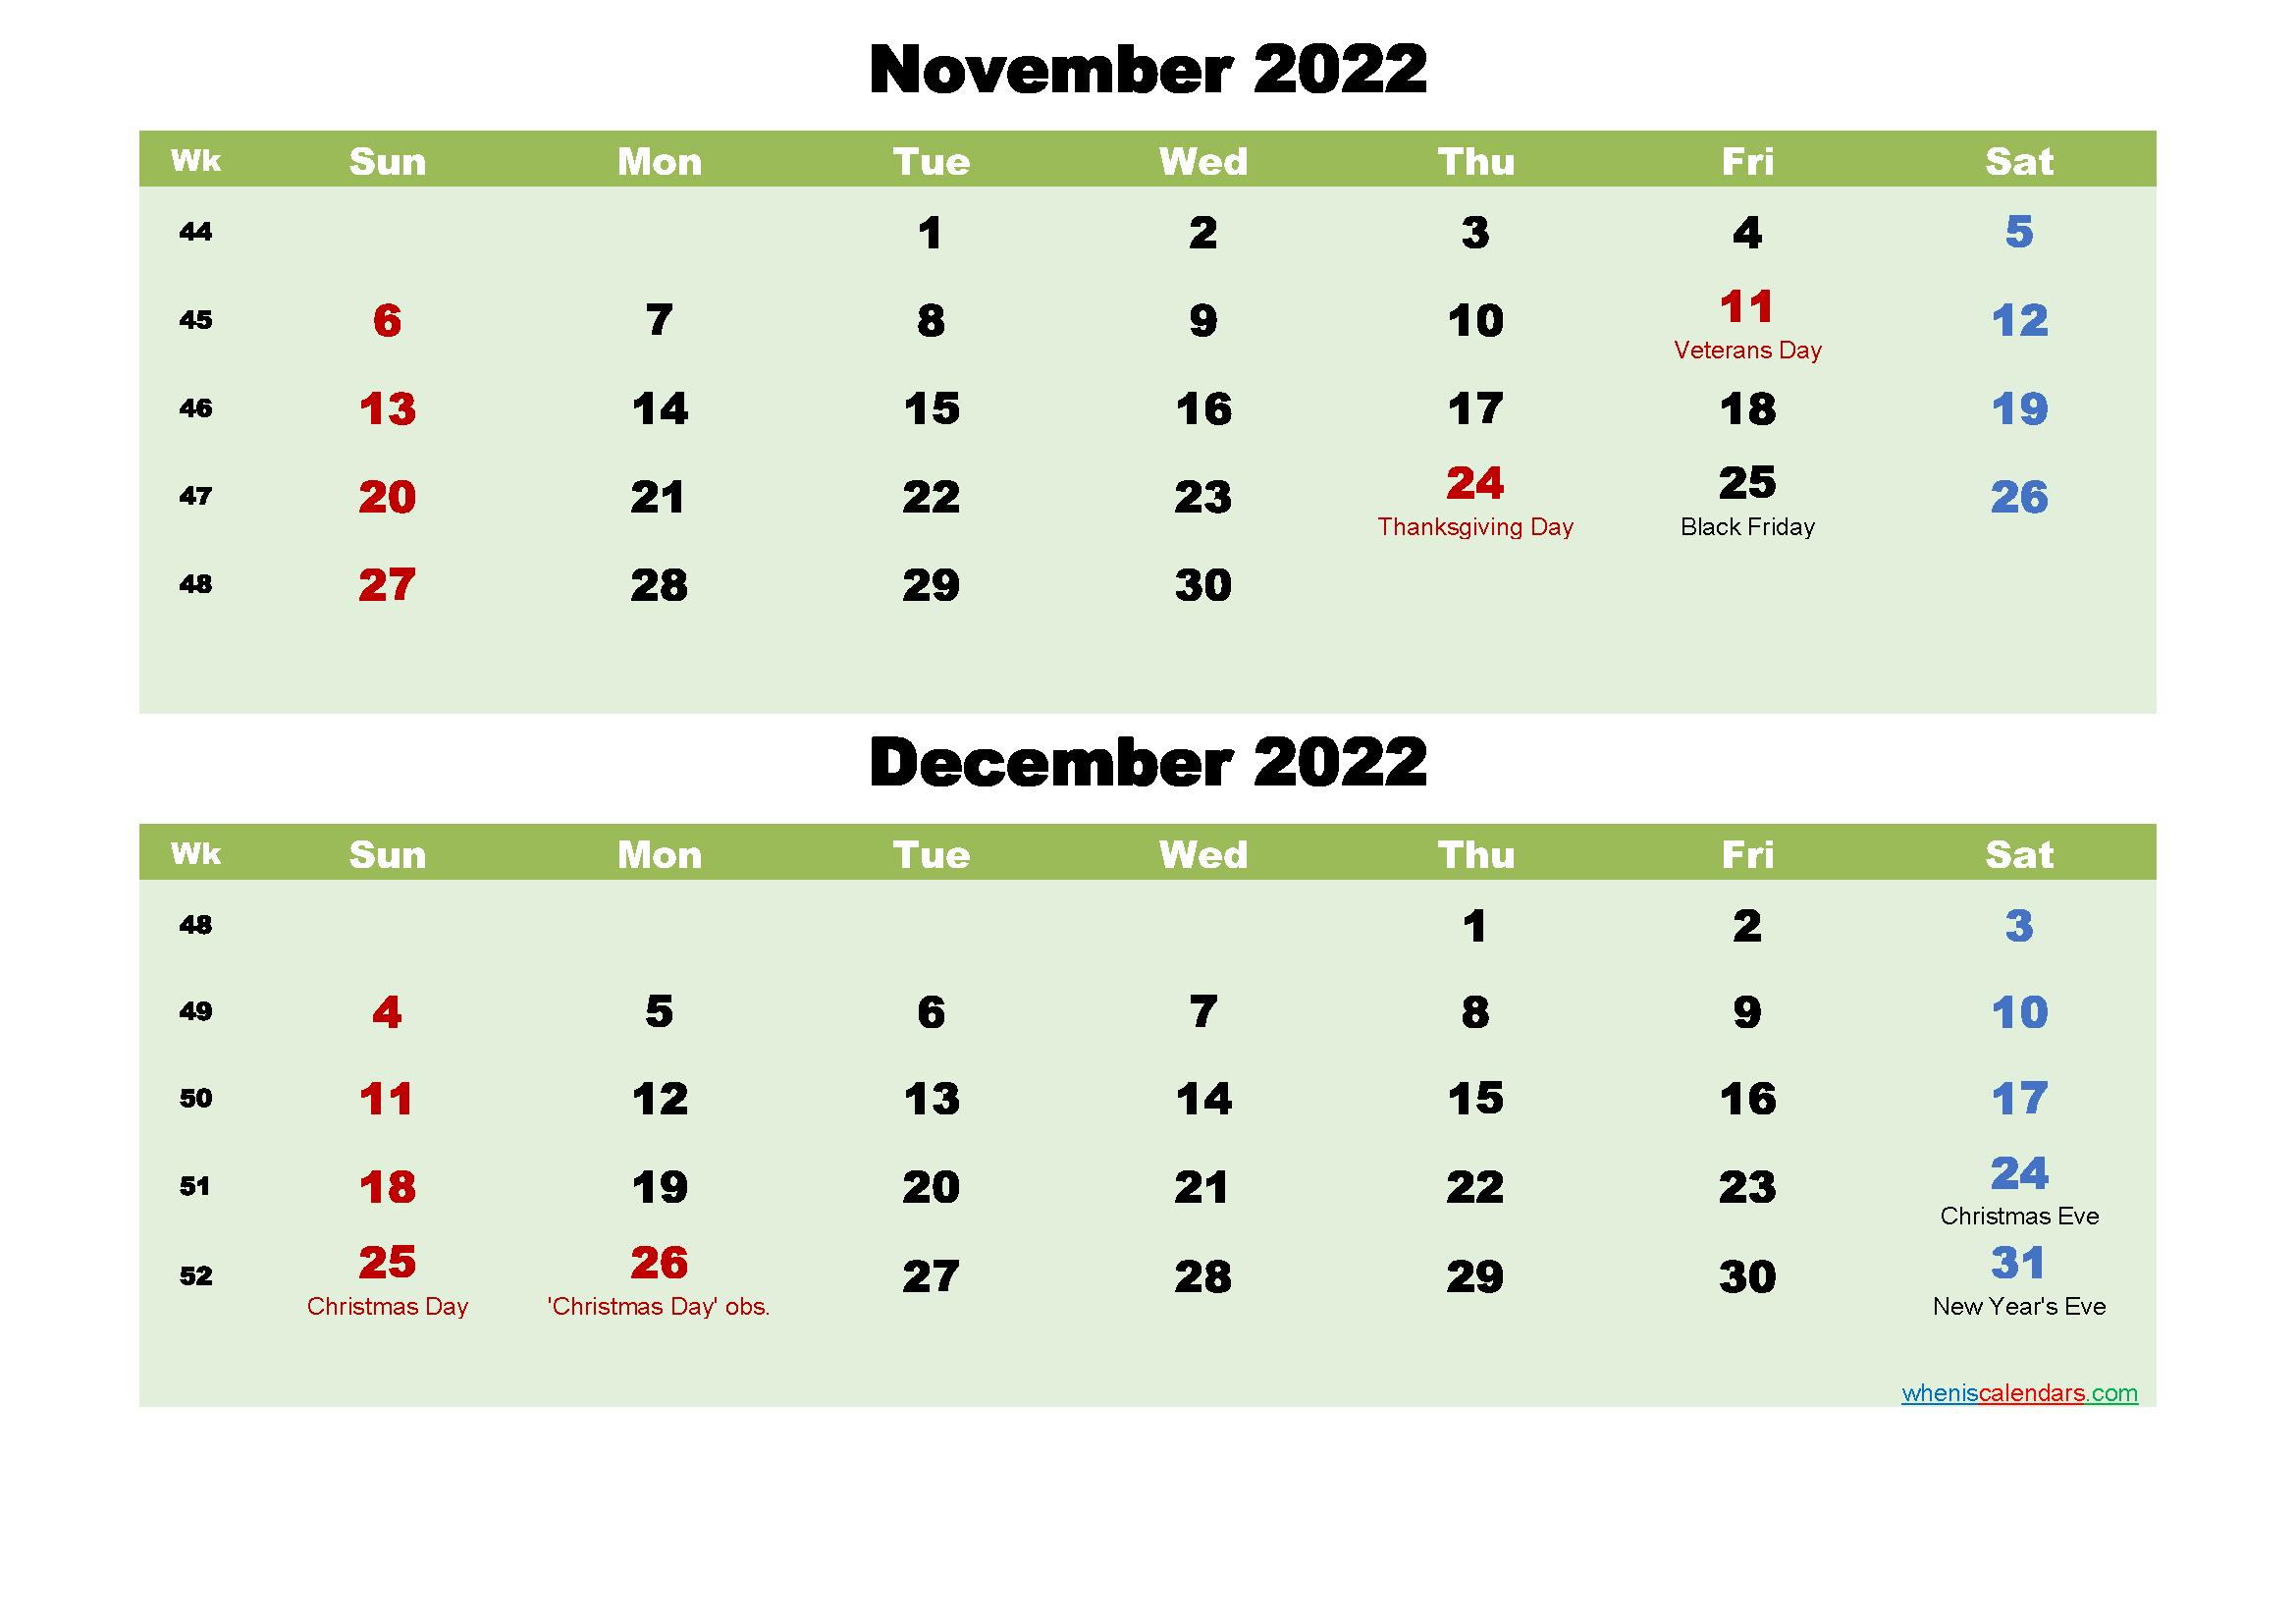 November and December 2022 Calendar with Holidays